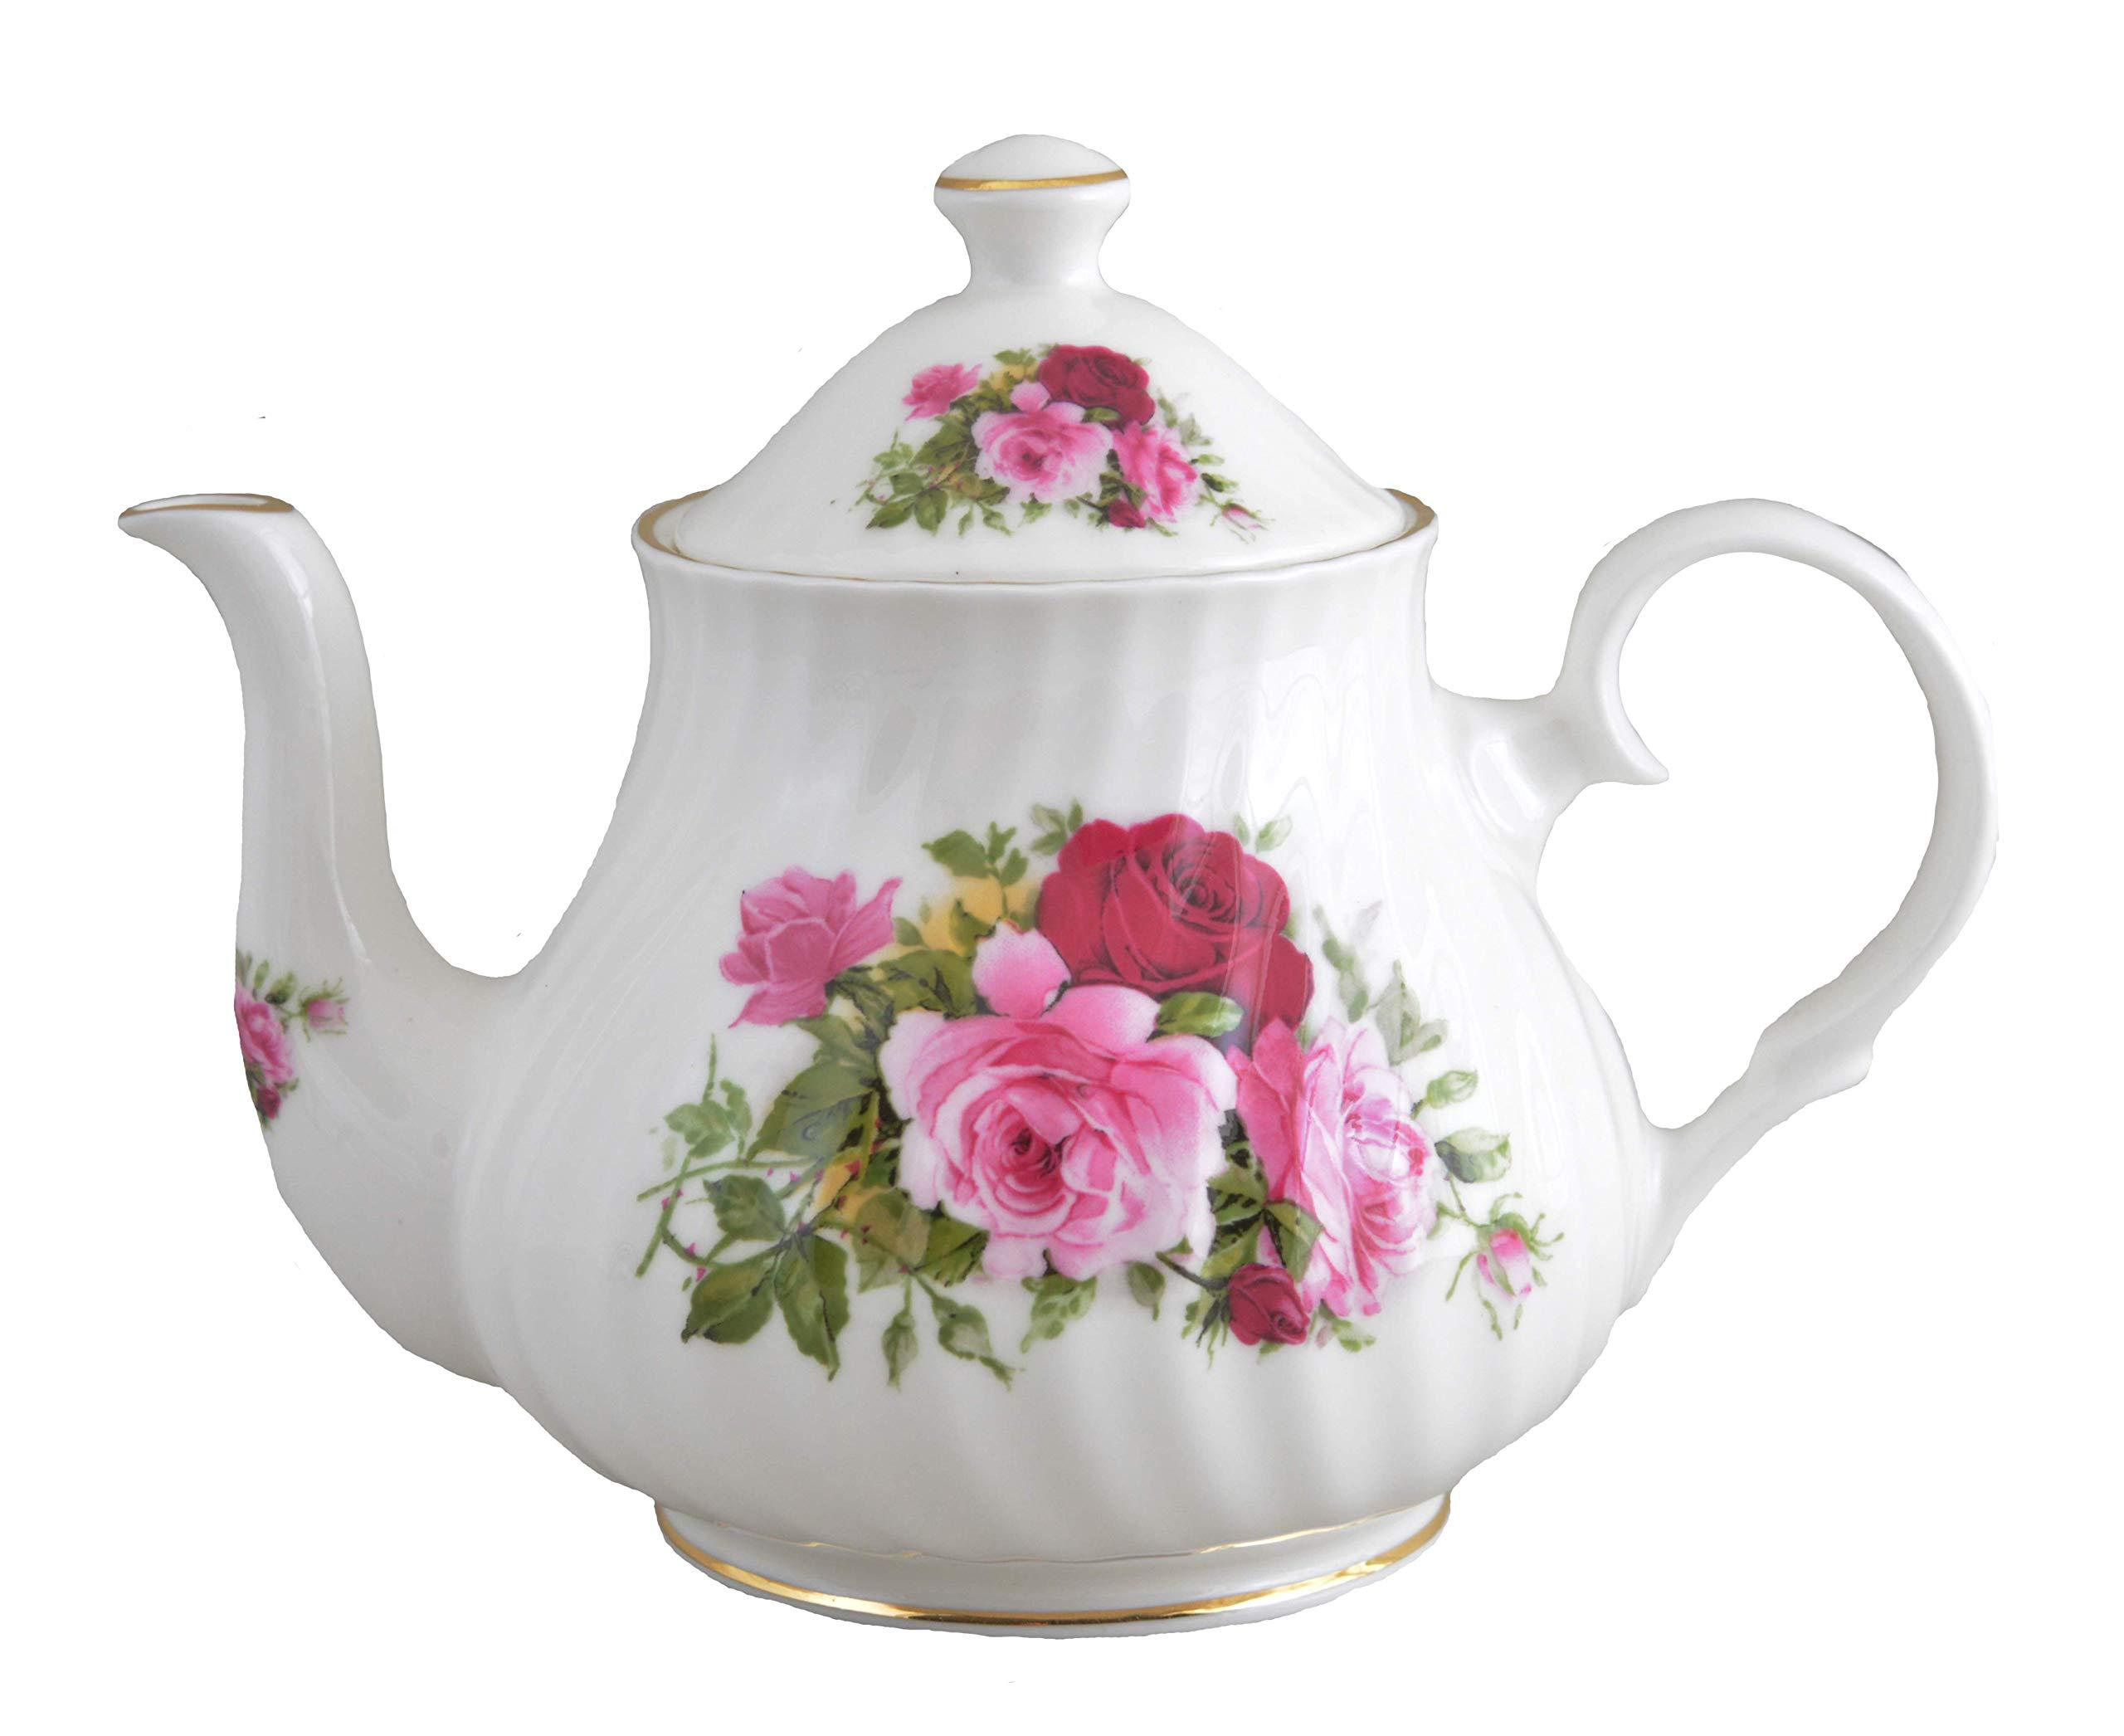 SUMMERTIME ROSE 4 Cup teapot - Fine English Bone China